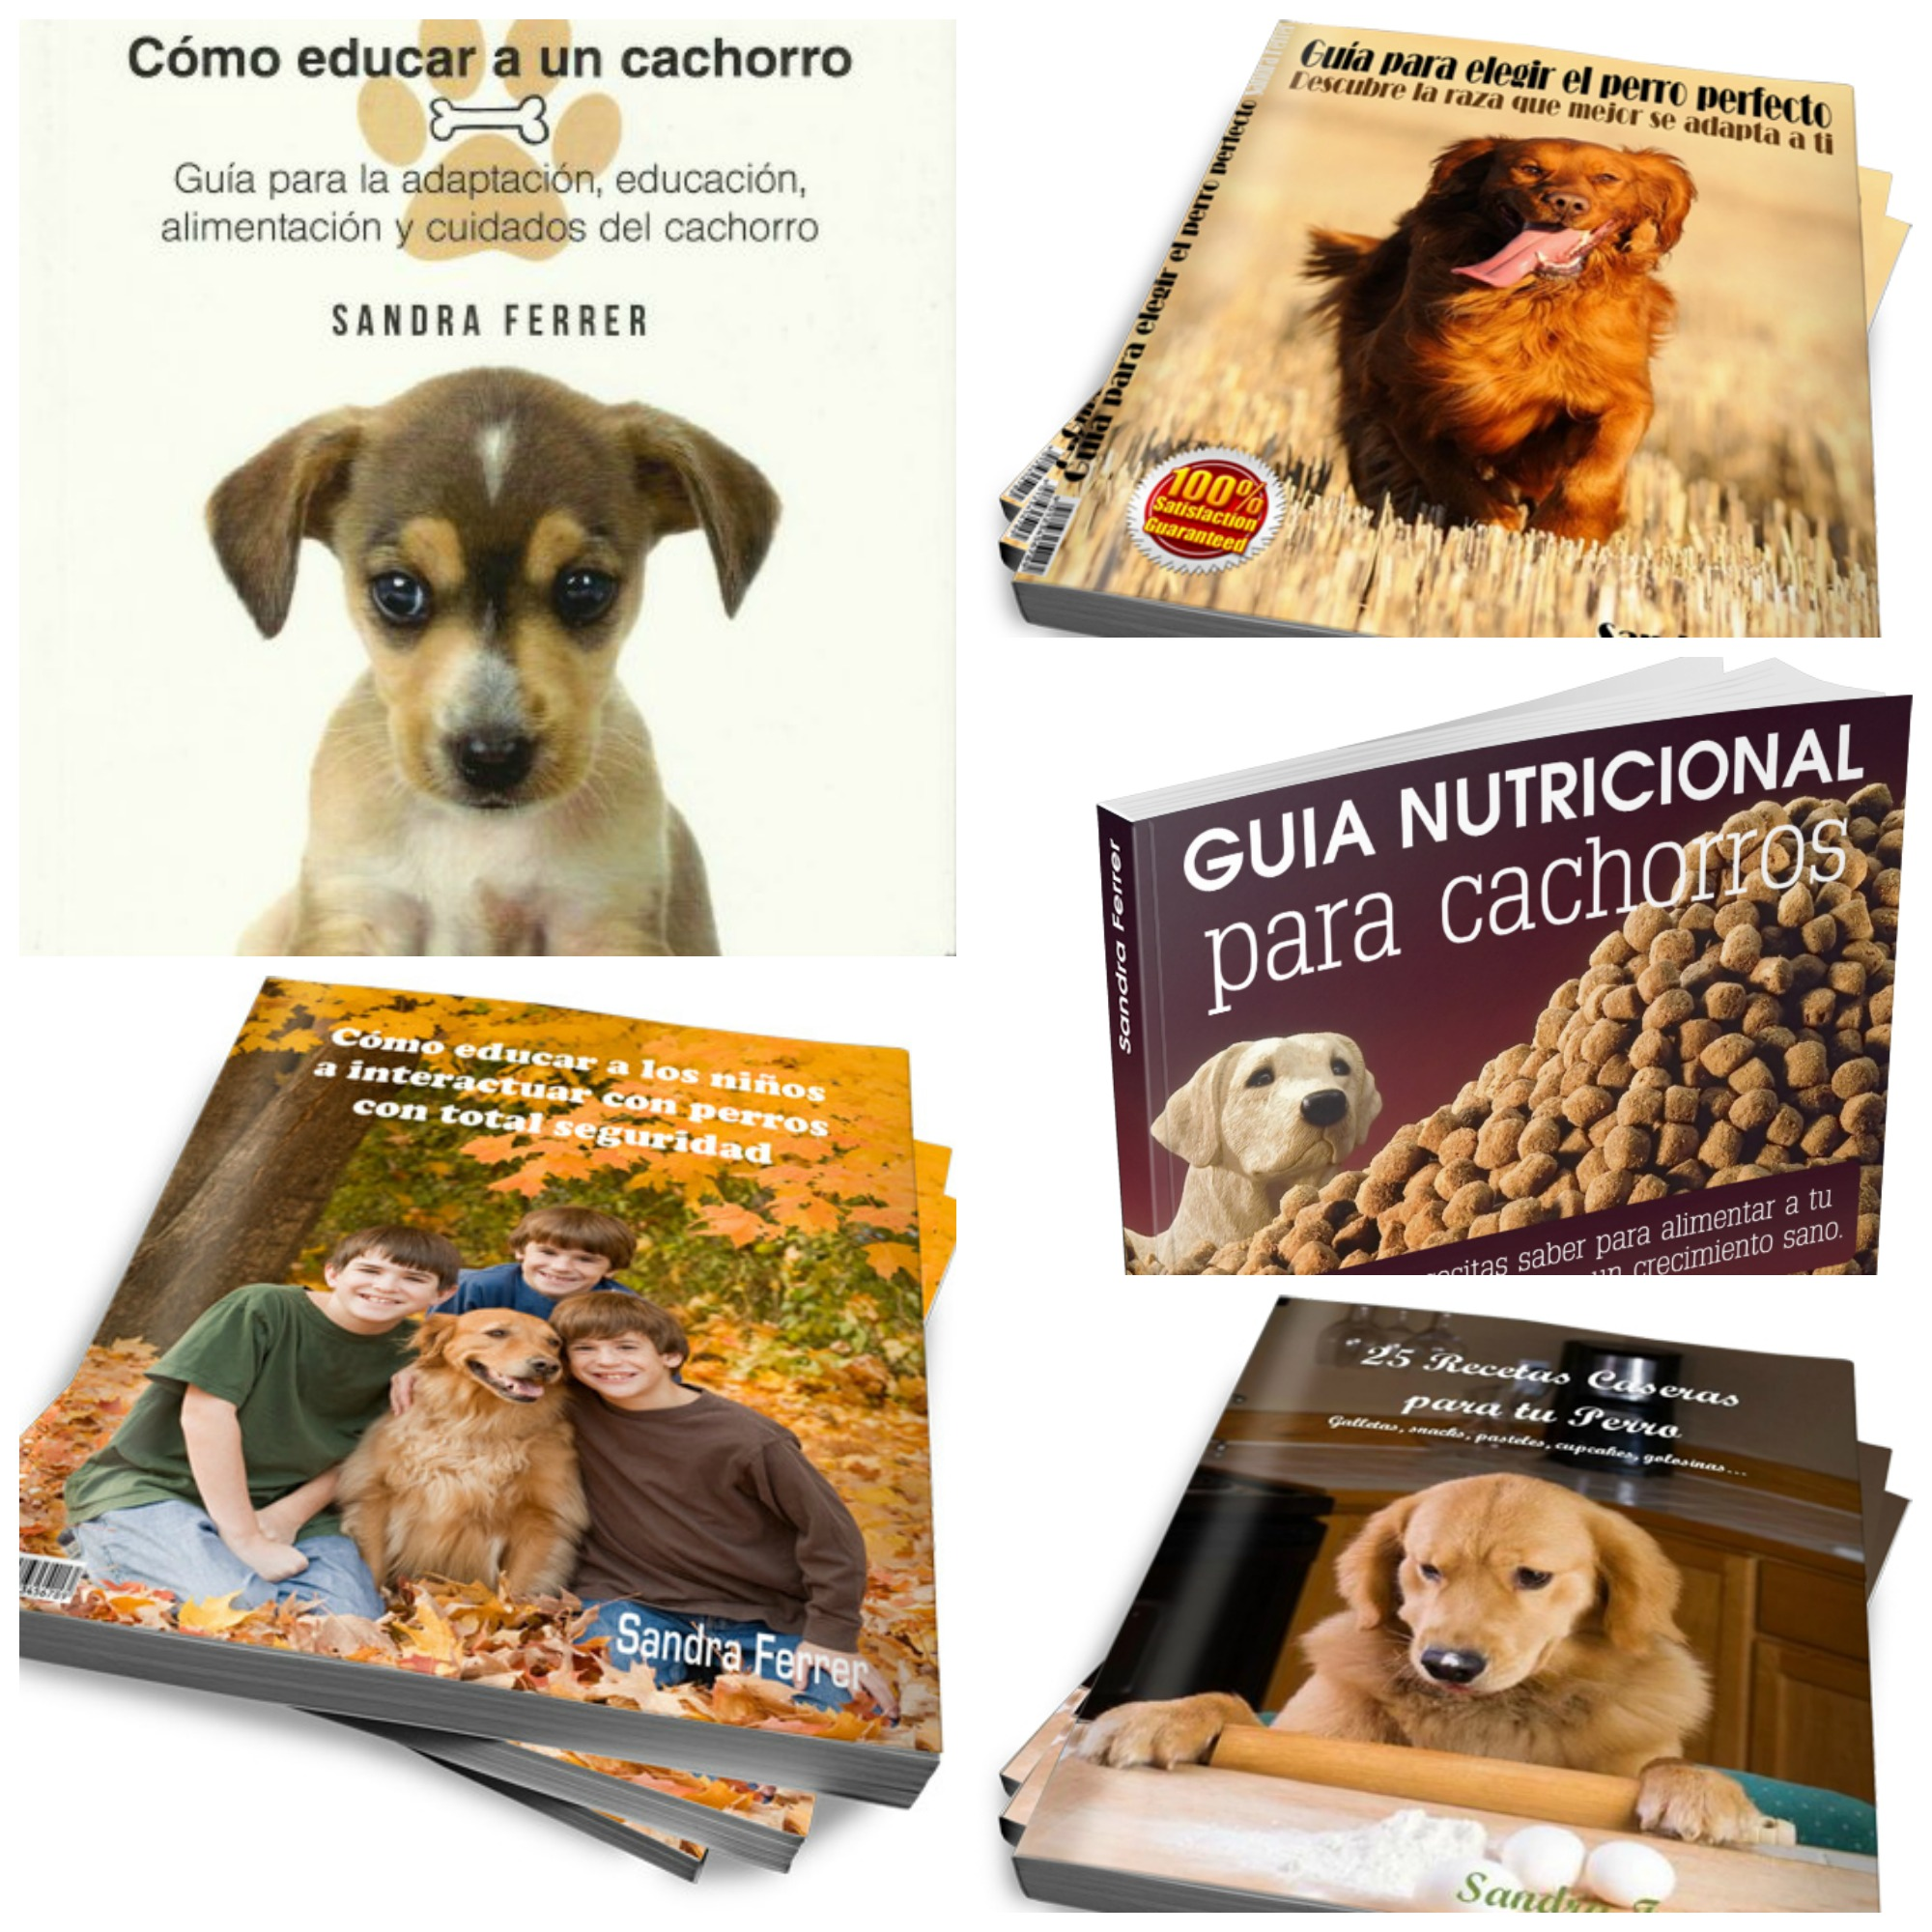 manuales de educación canina para principiantes